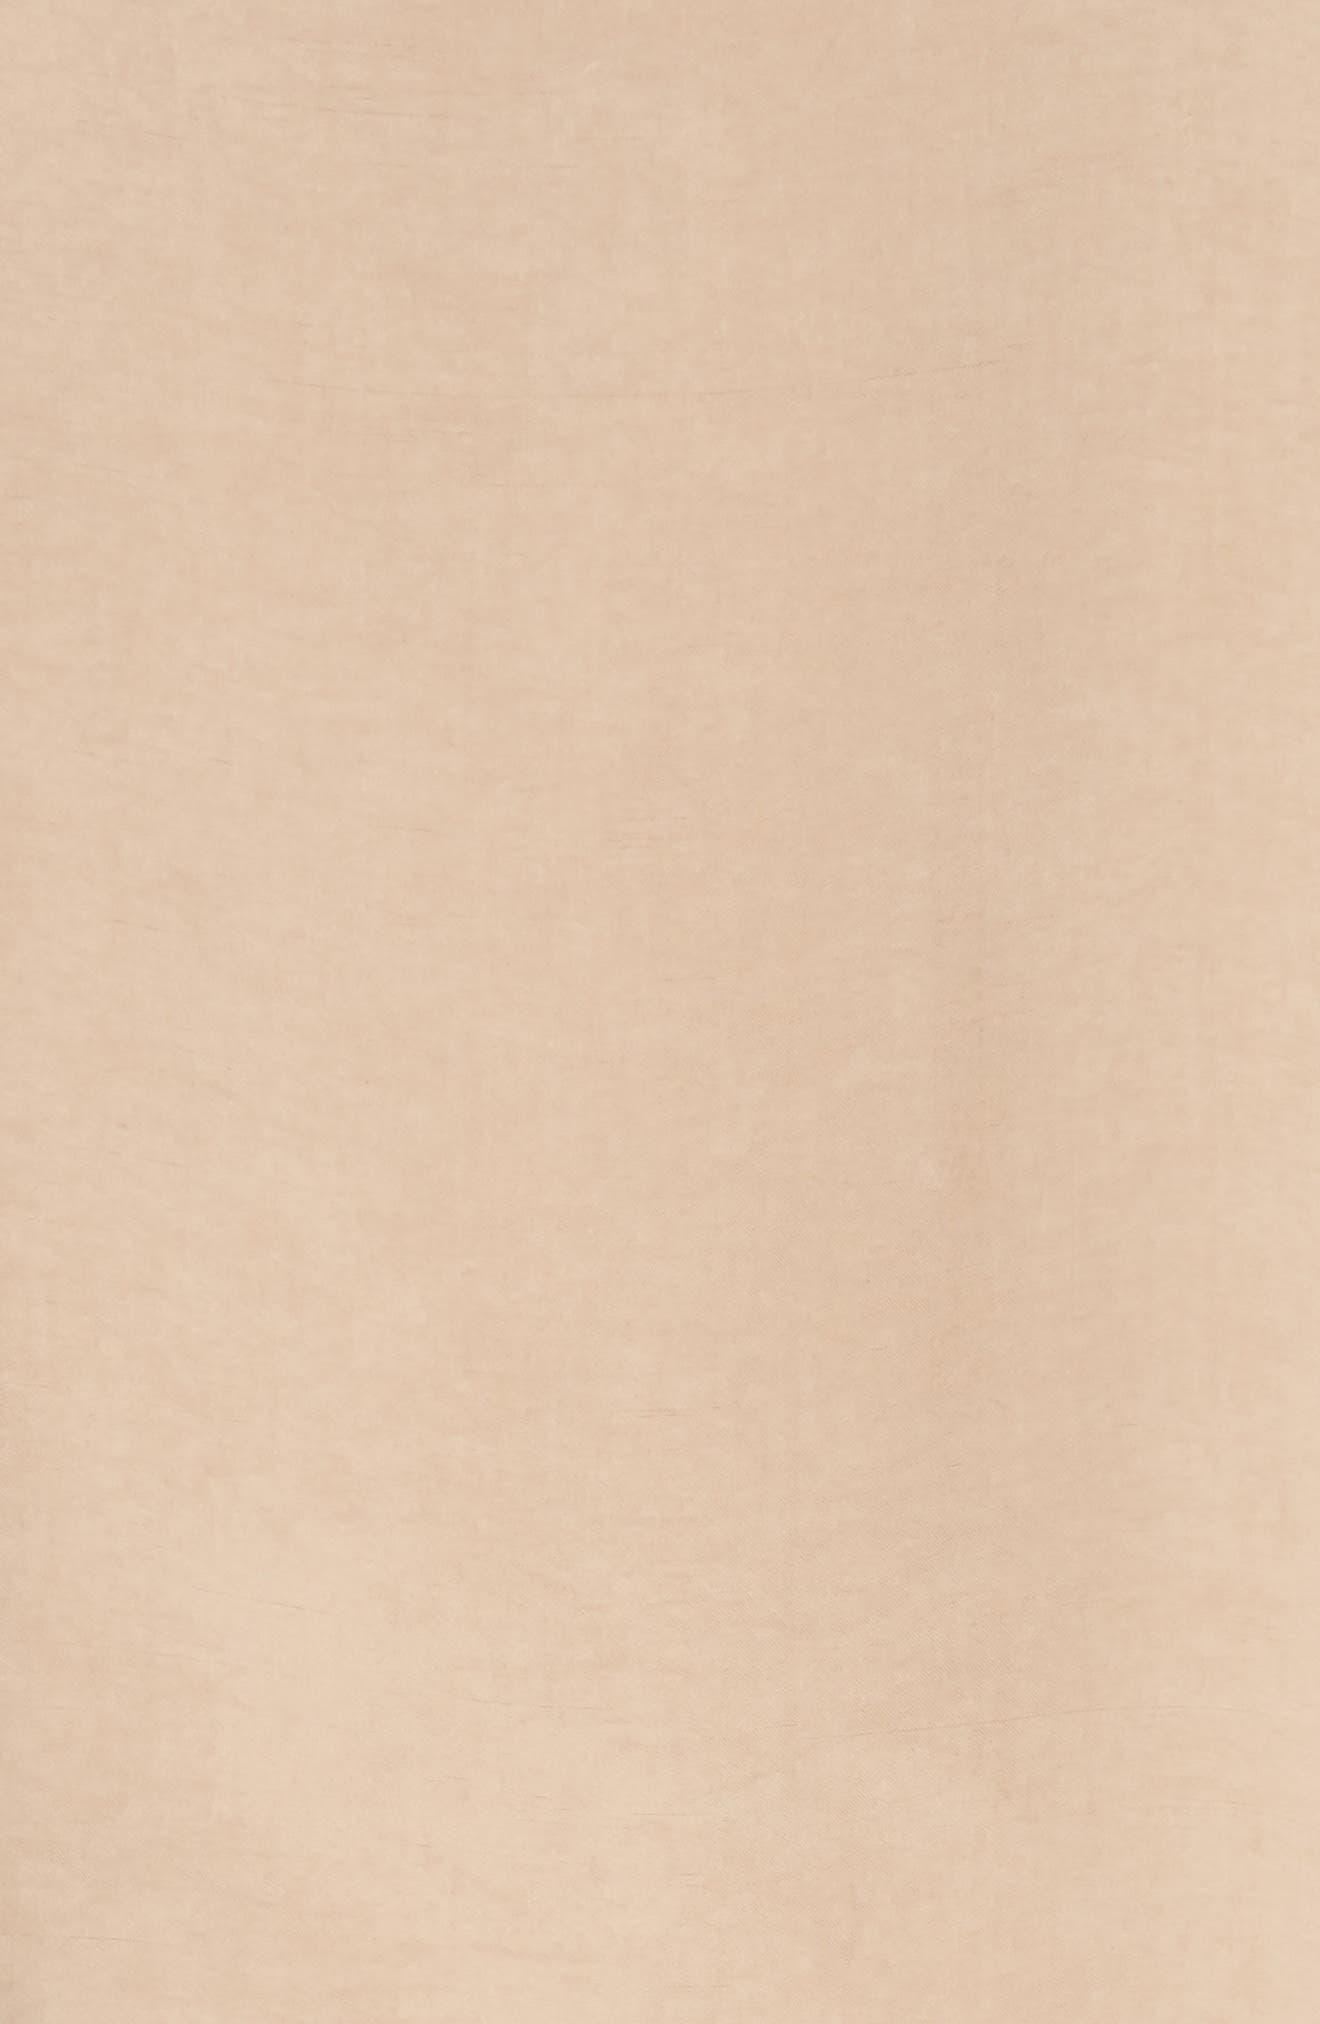 Pierced Trench Coat,                             Alternate thumbnail 3, color,                             Sierra